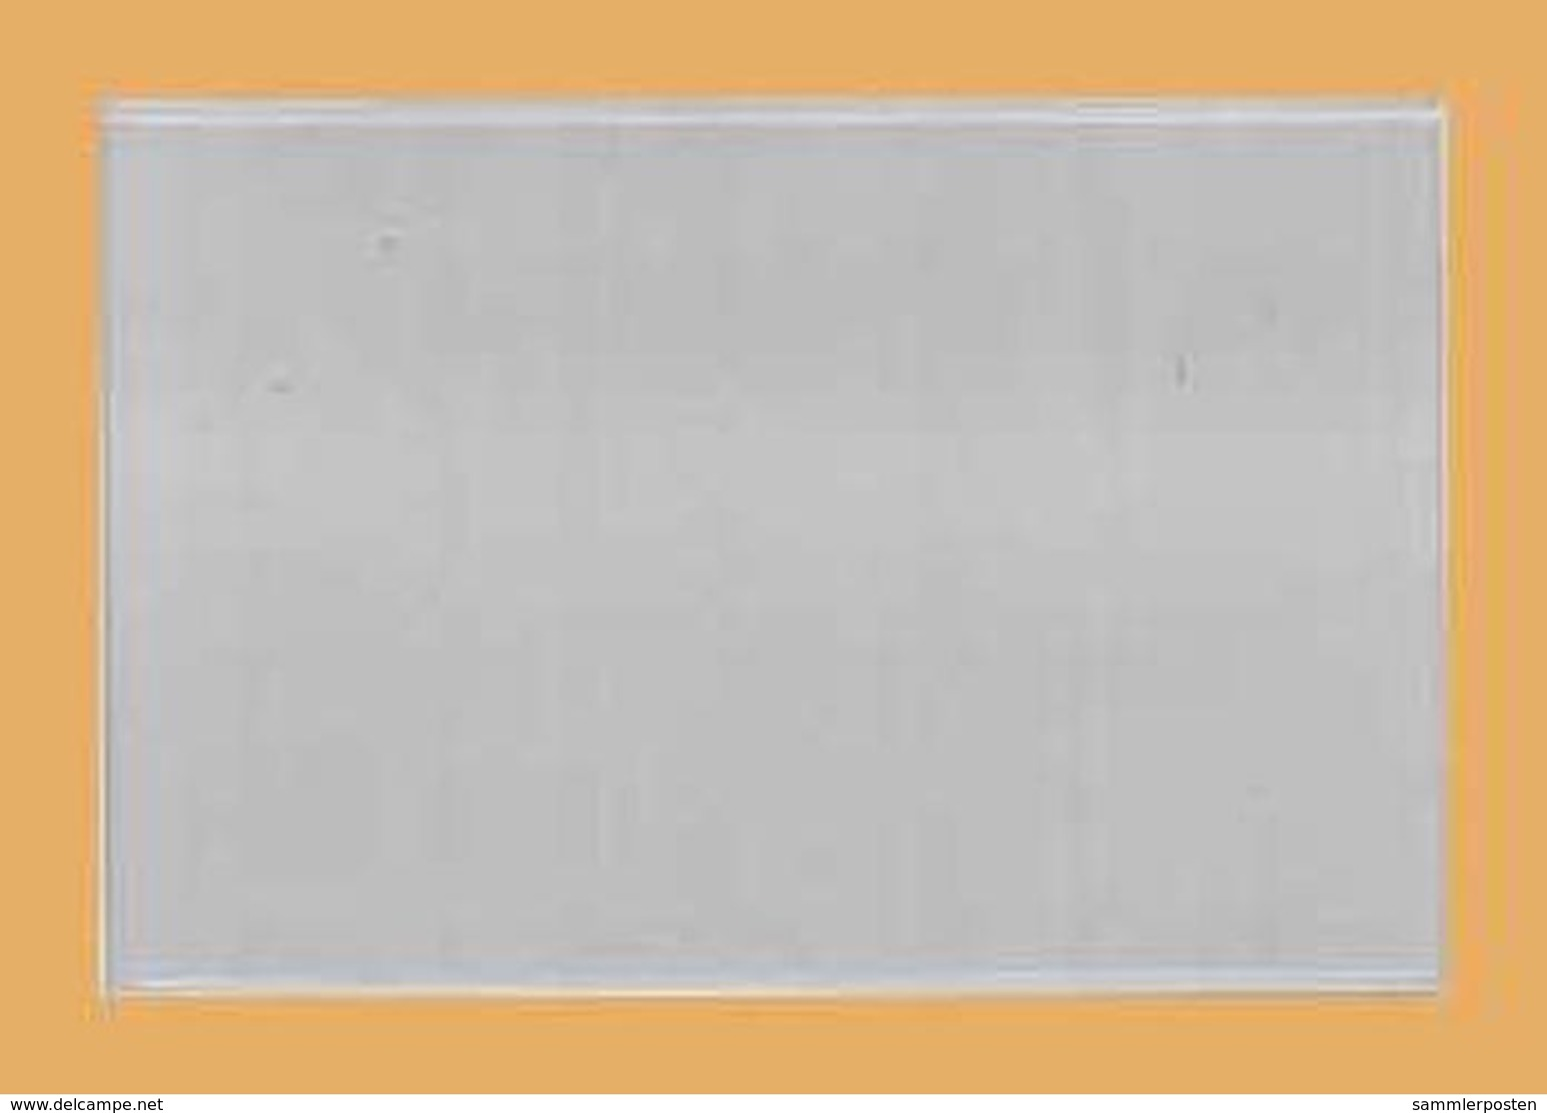 100x KOBRA-Telefonkartenhülle Nr. T71 - Telefoonkaarten